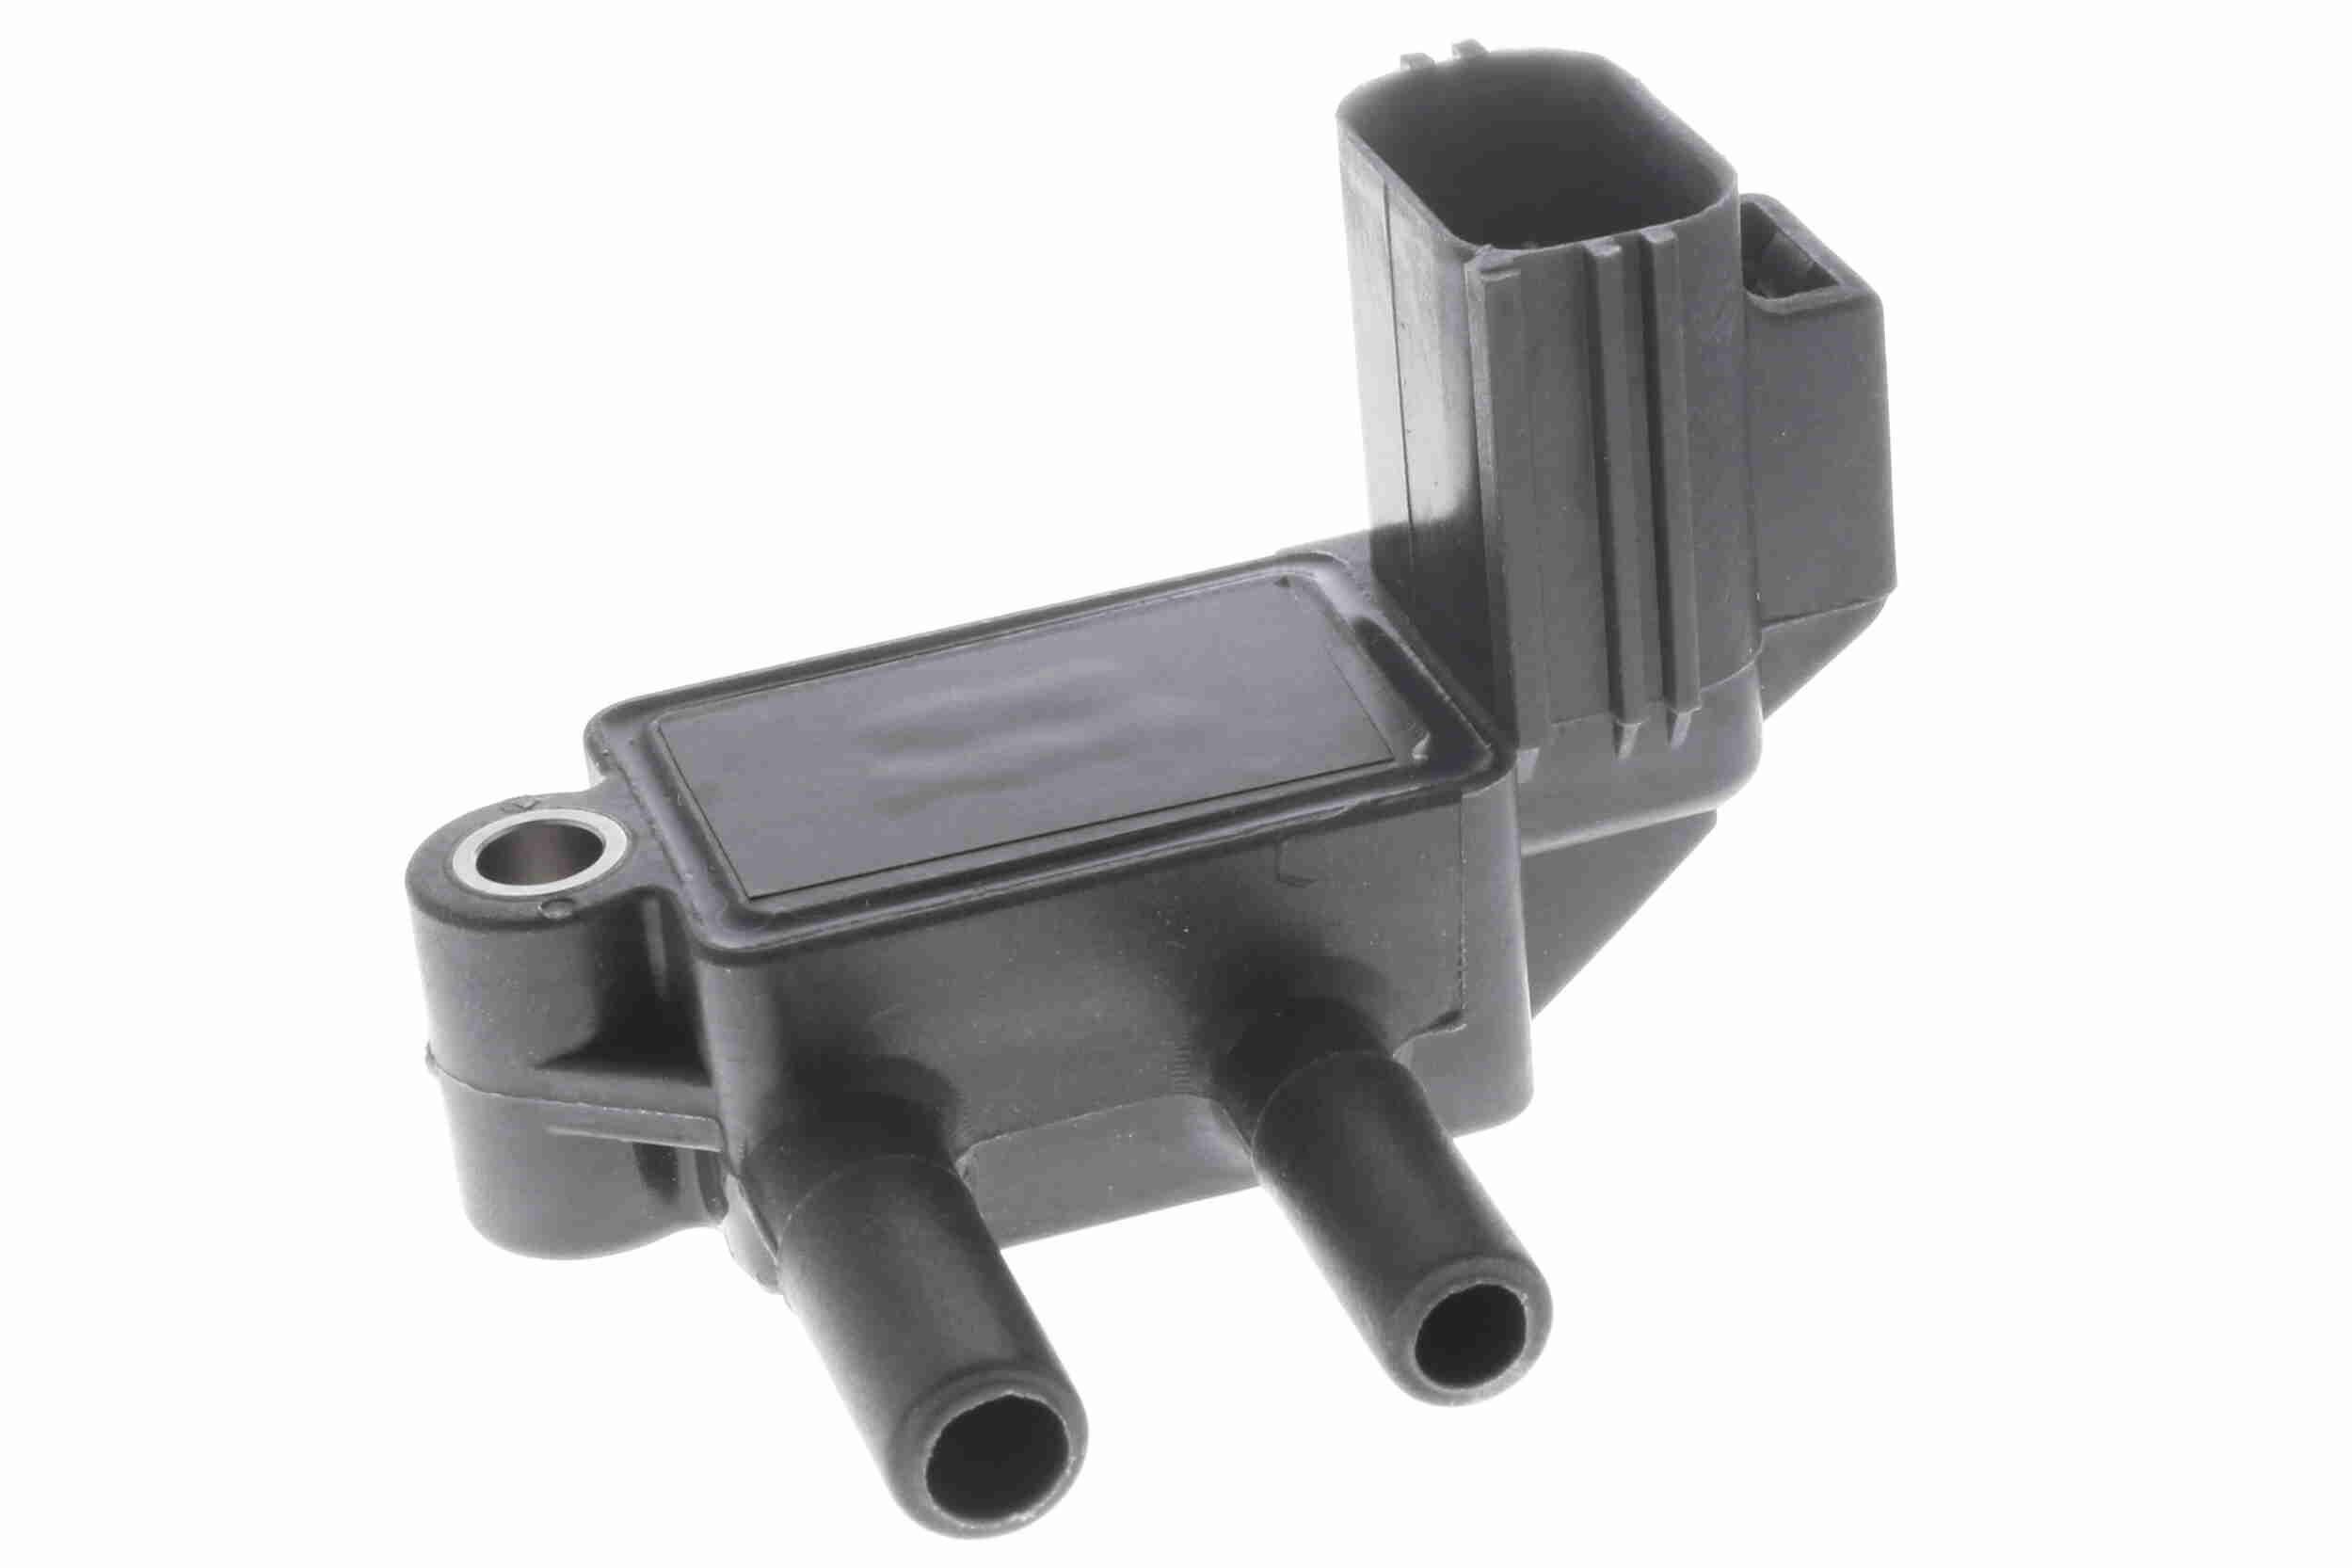 Original RENAULT Abgasdrucksensor V25-72-1238